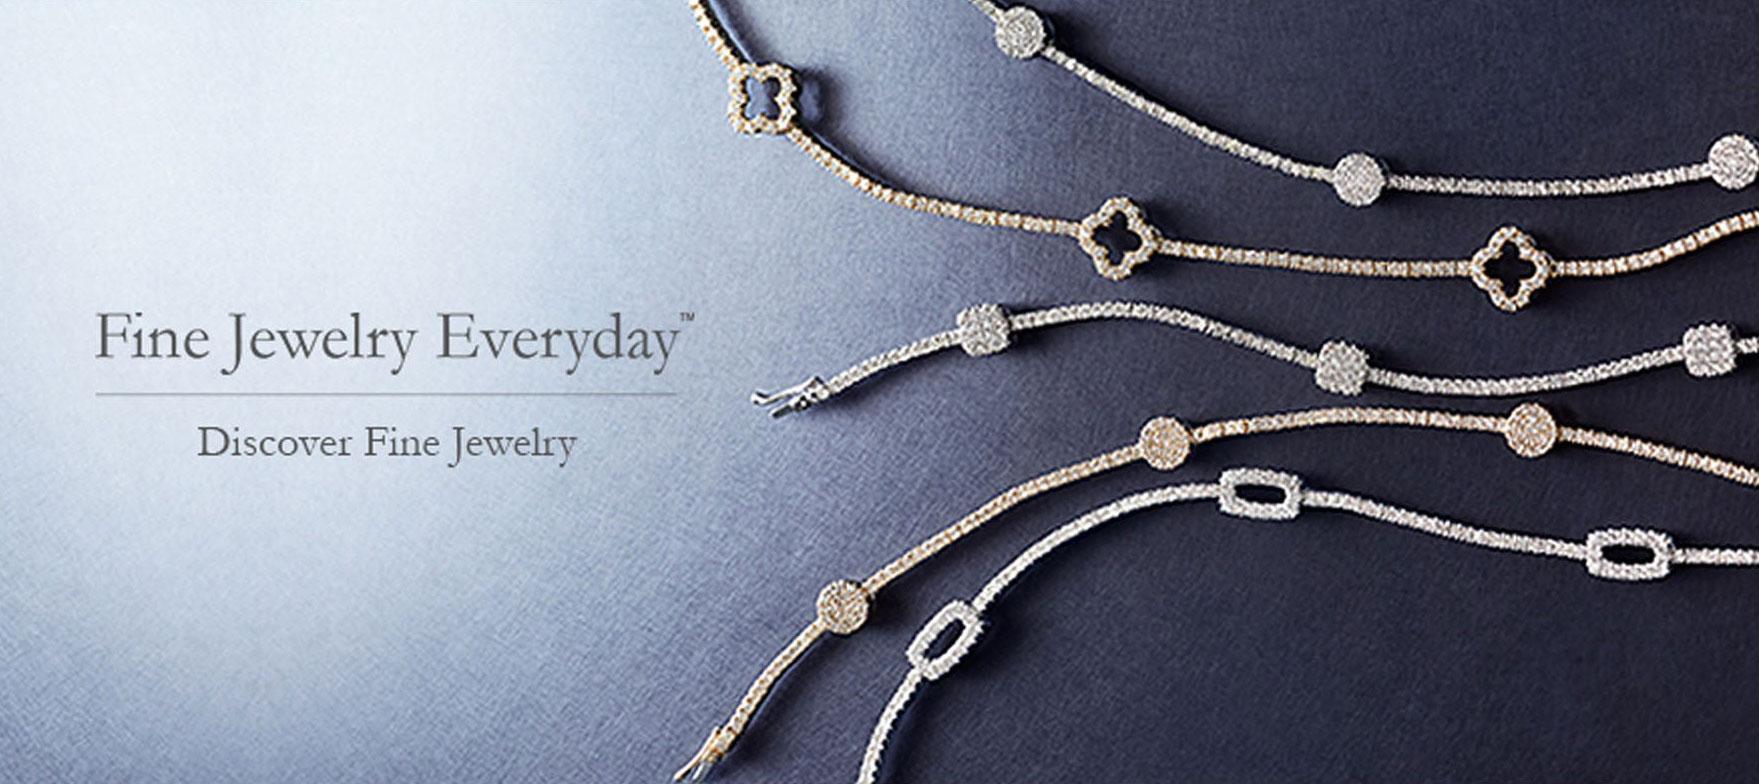 discover fine jewelry